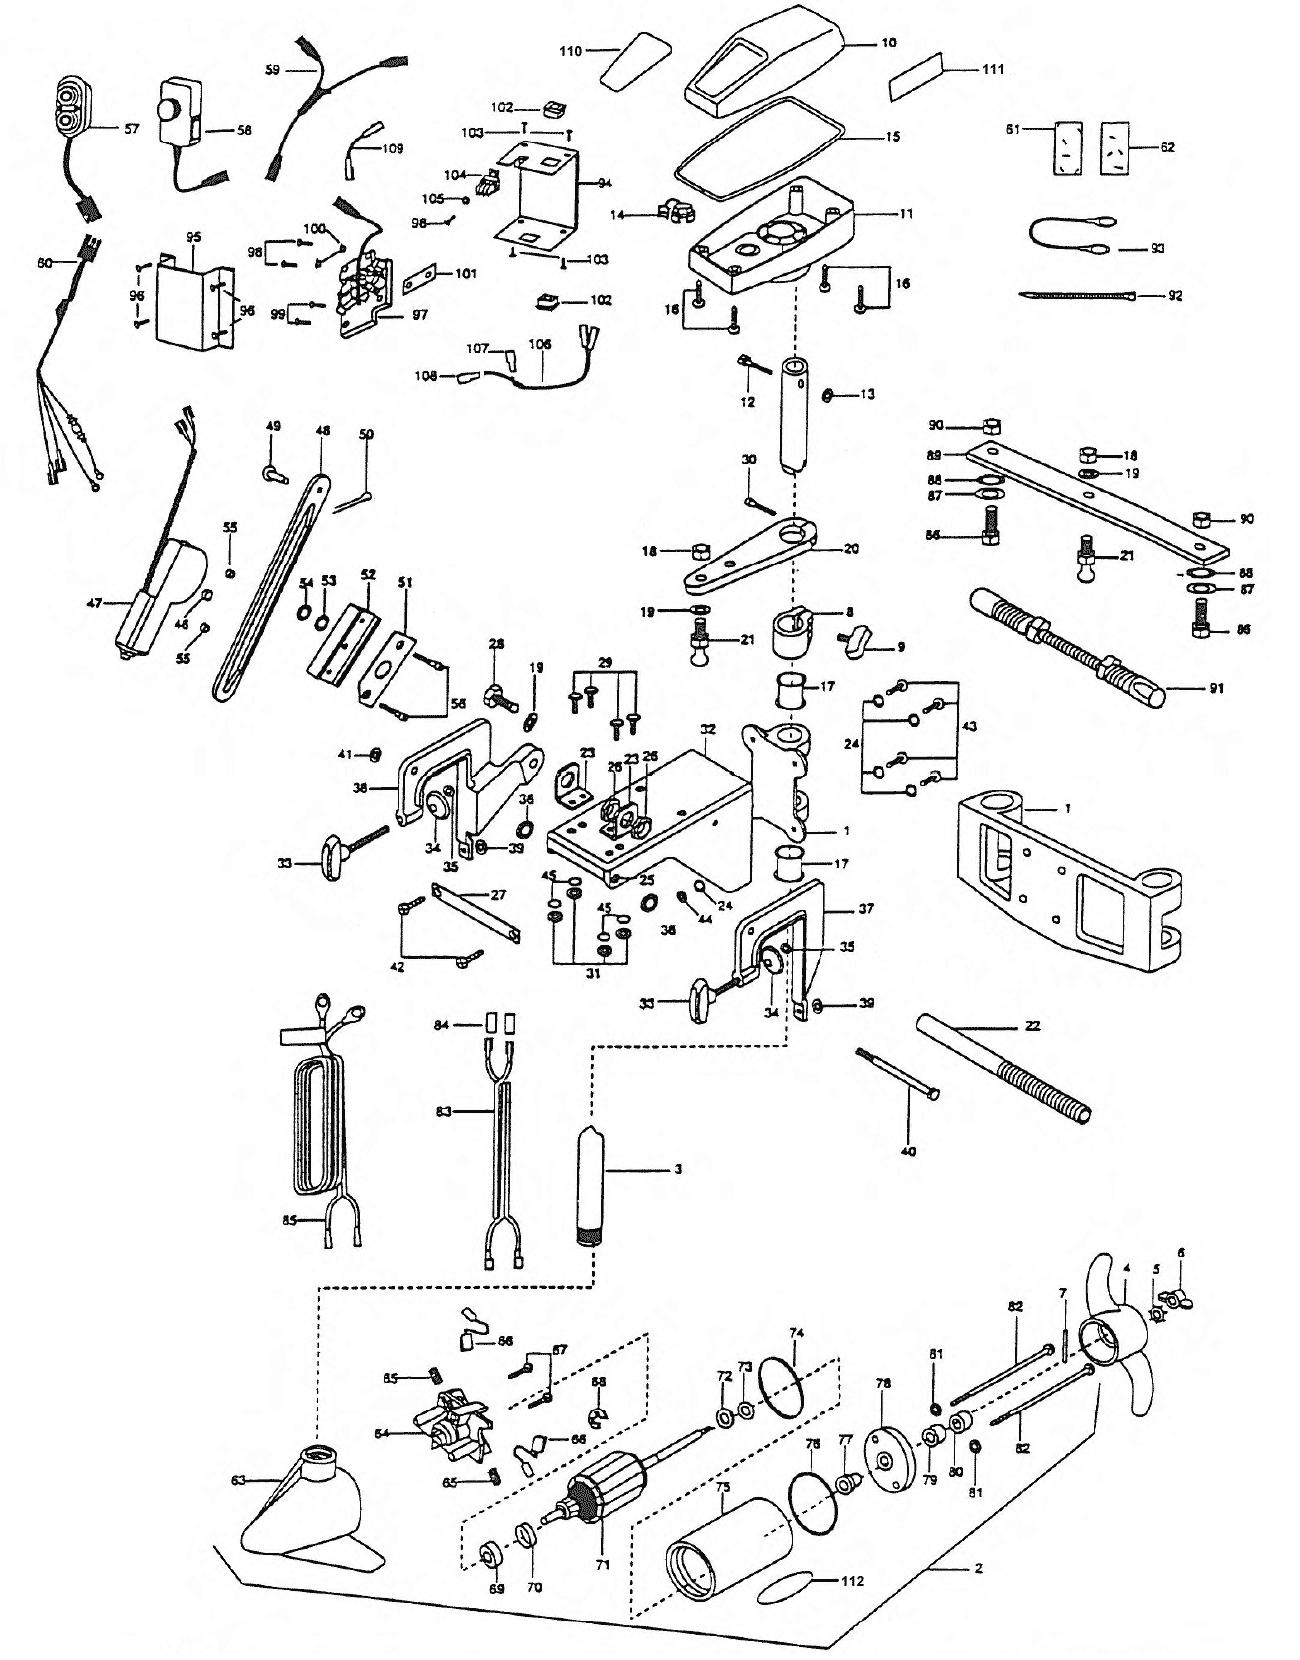 minn kota 1998 electric primary ep96 parts